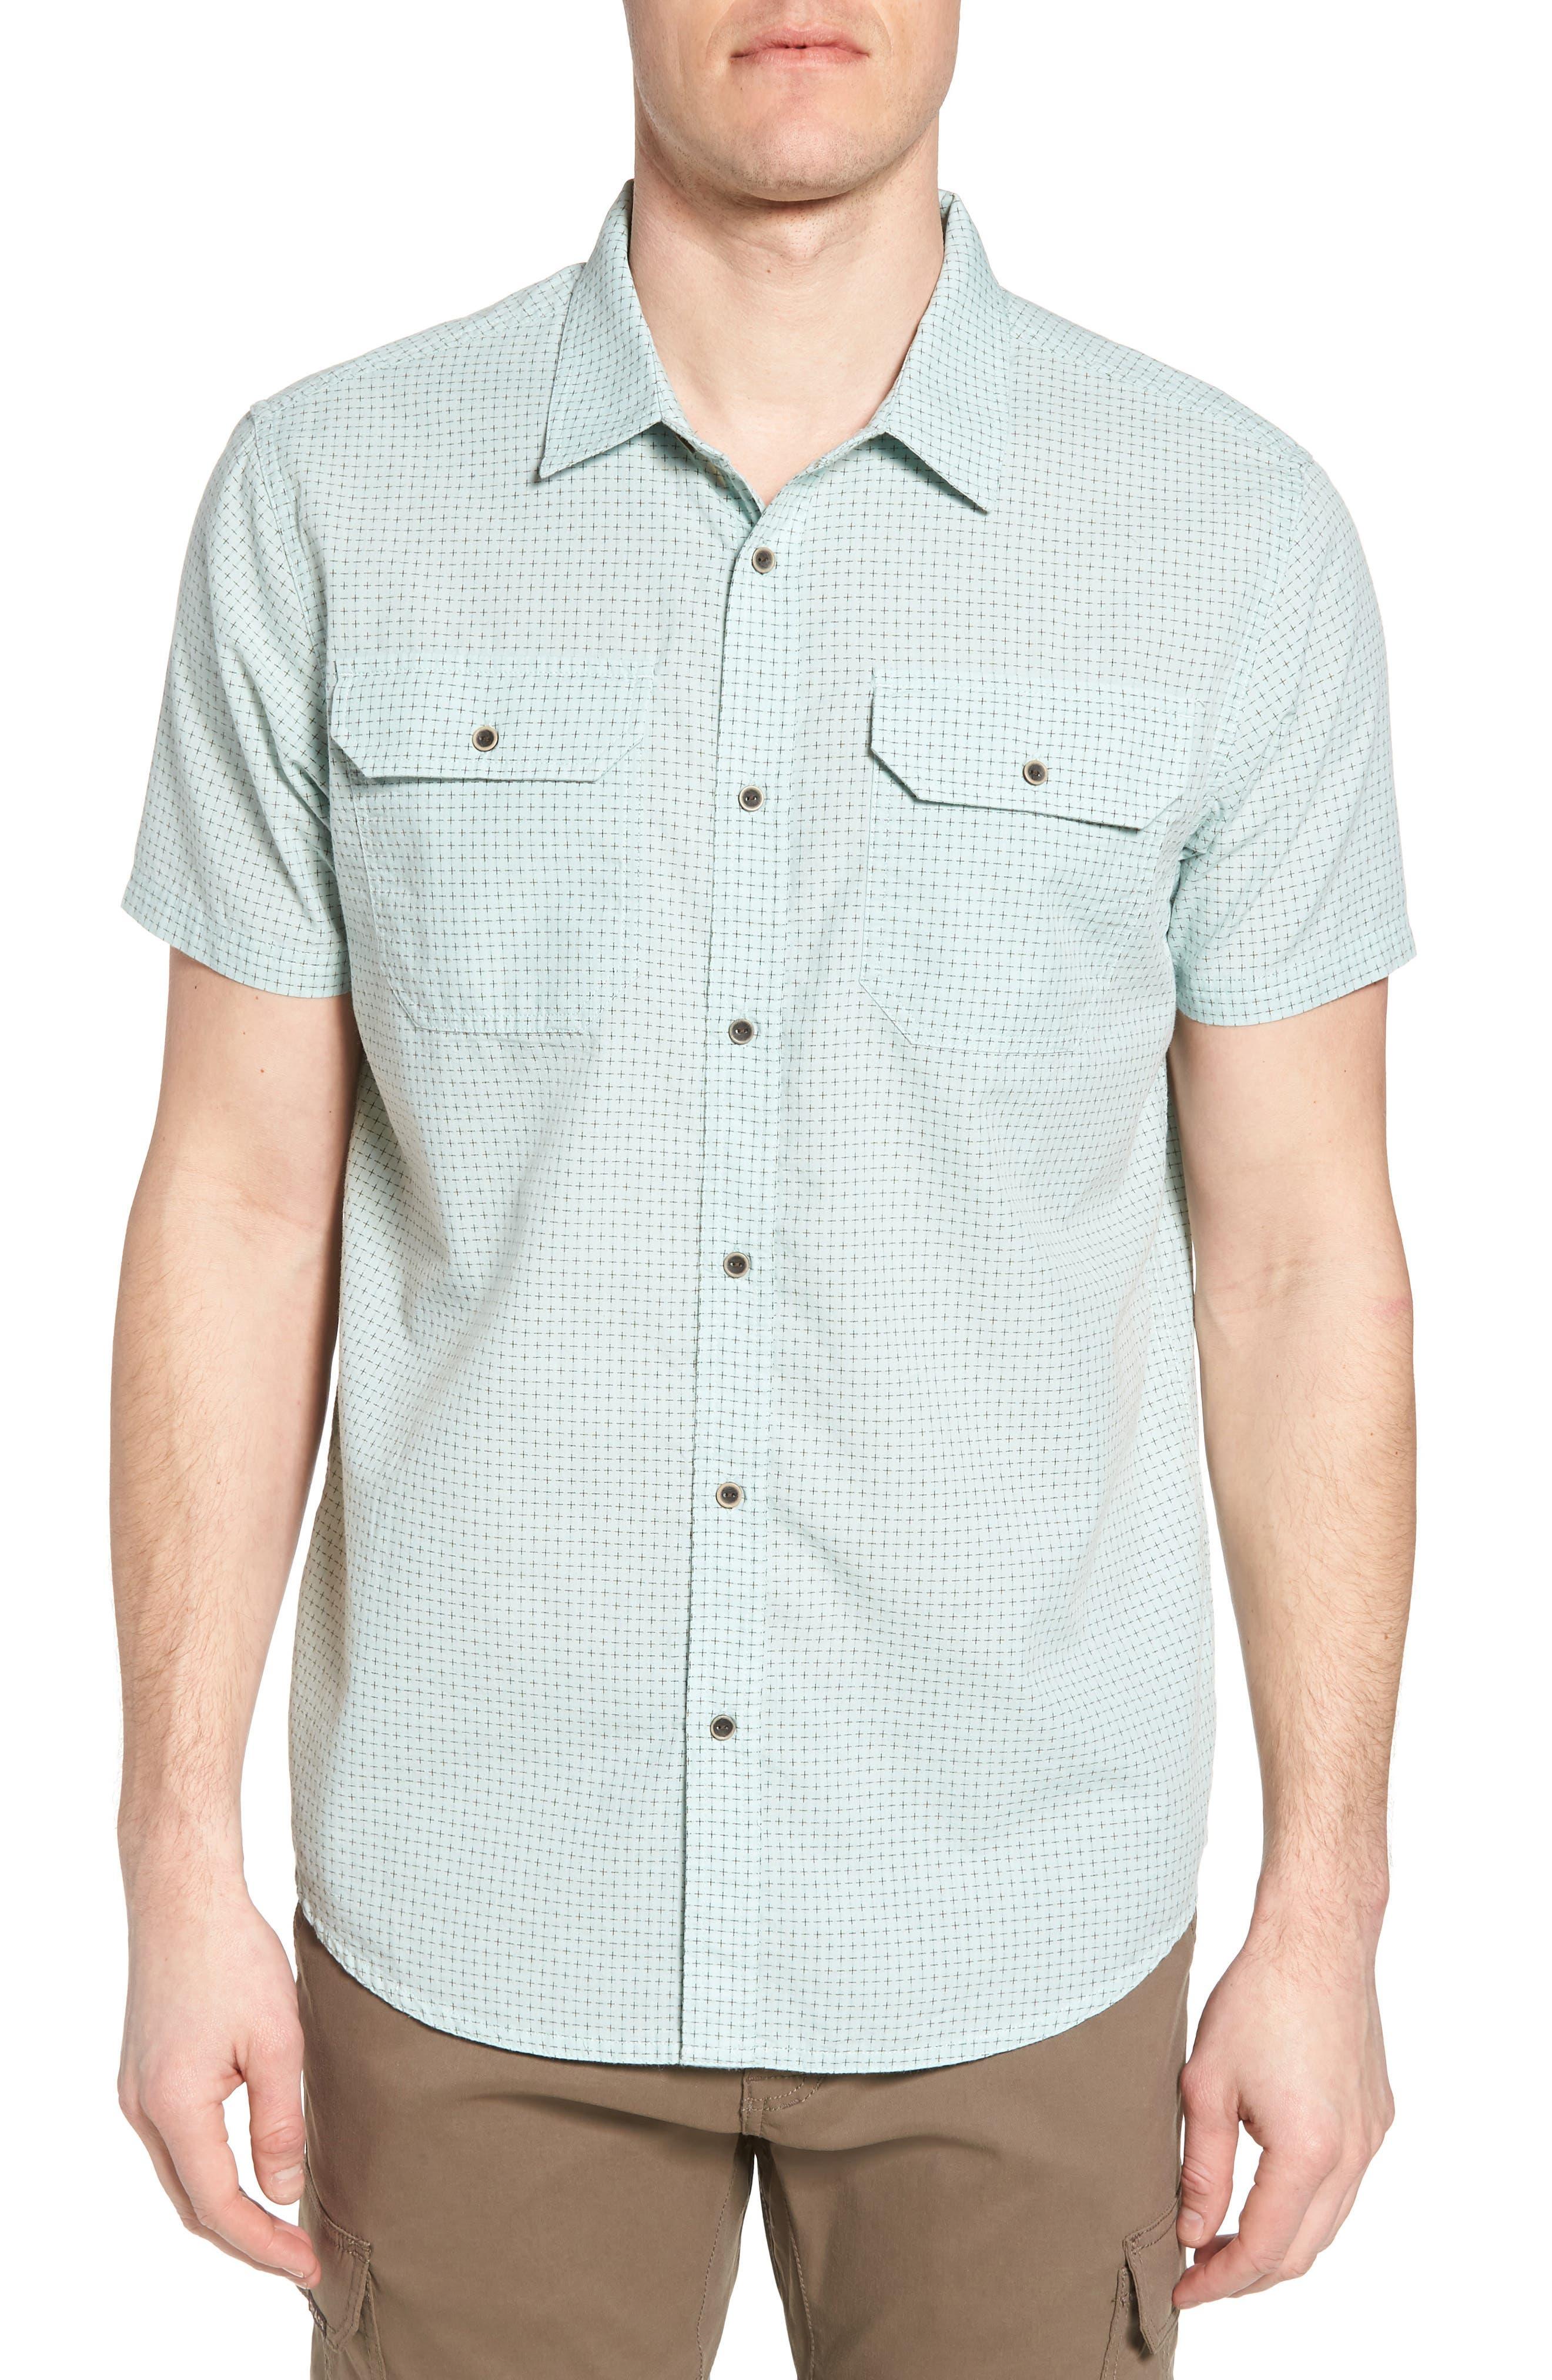 Blakely Slim Fit Short Sleeve Sport Shirt,                             Main thumbnail 1, color,                             300